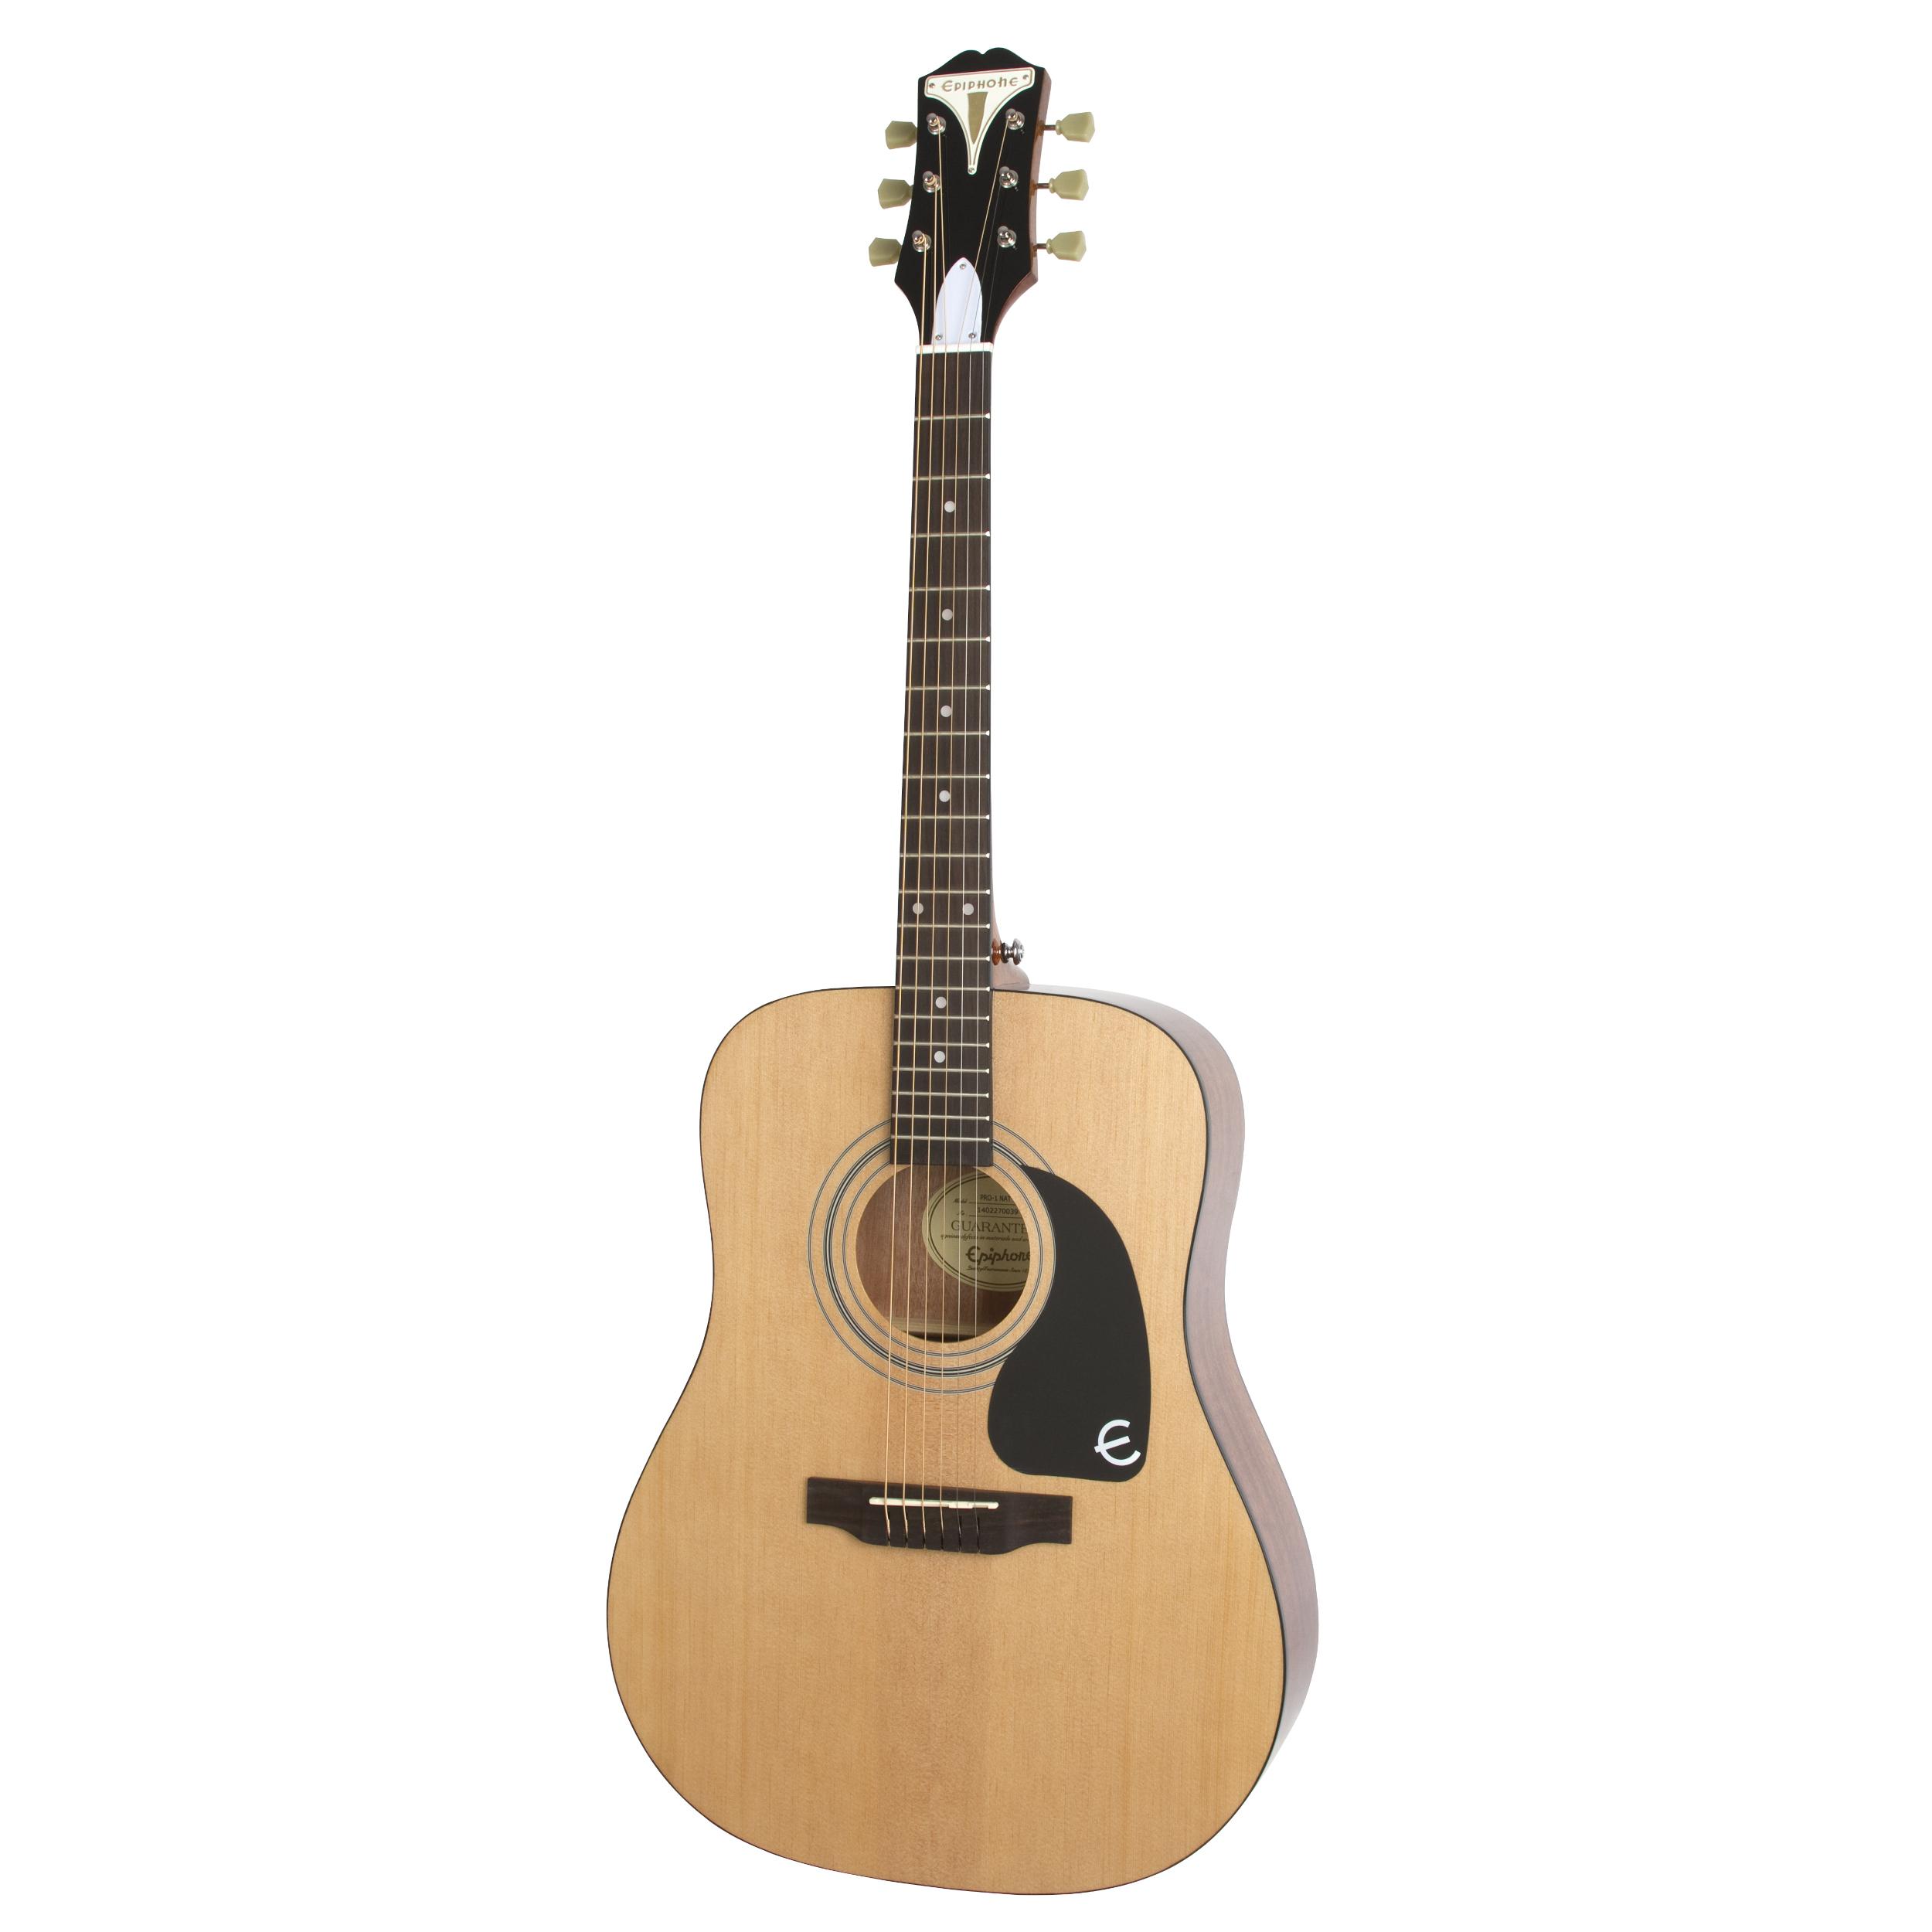 Epiphone PRO-1 - Natural Guitar